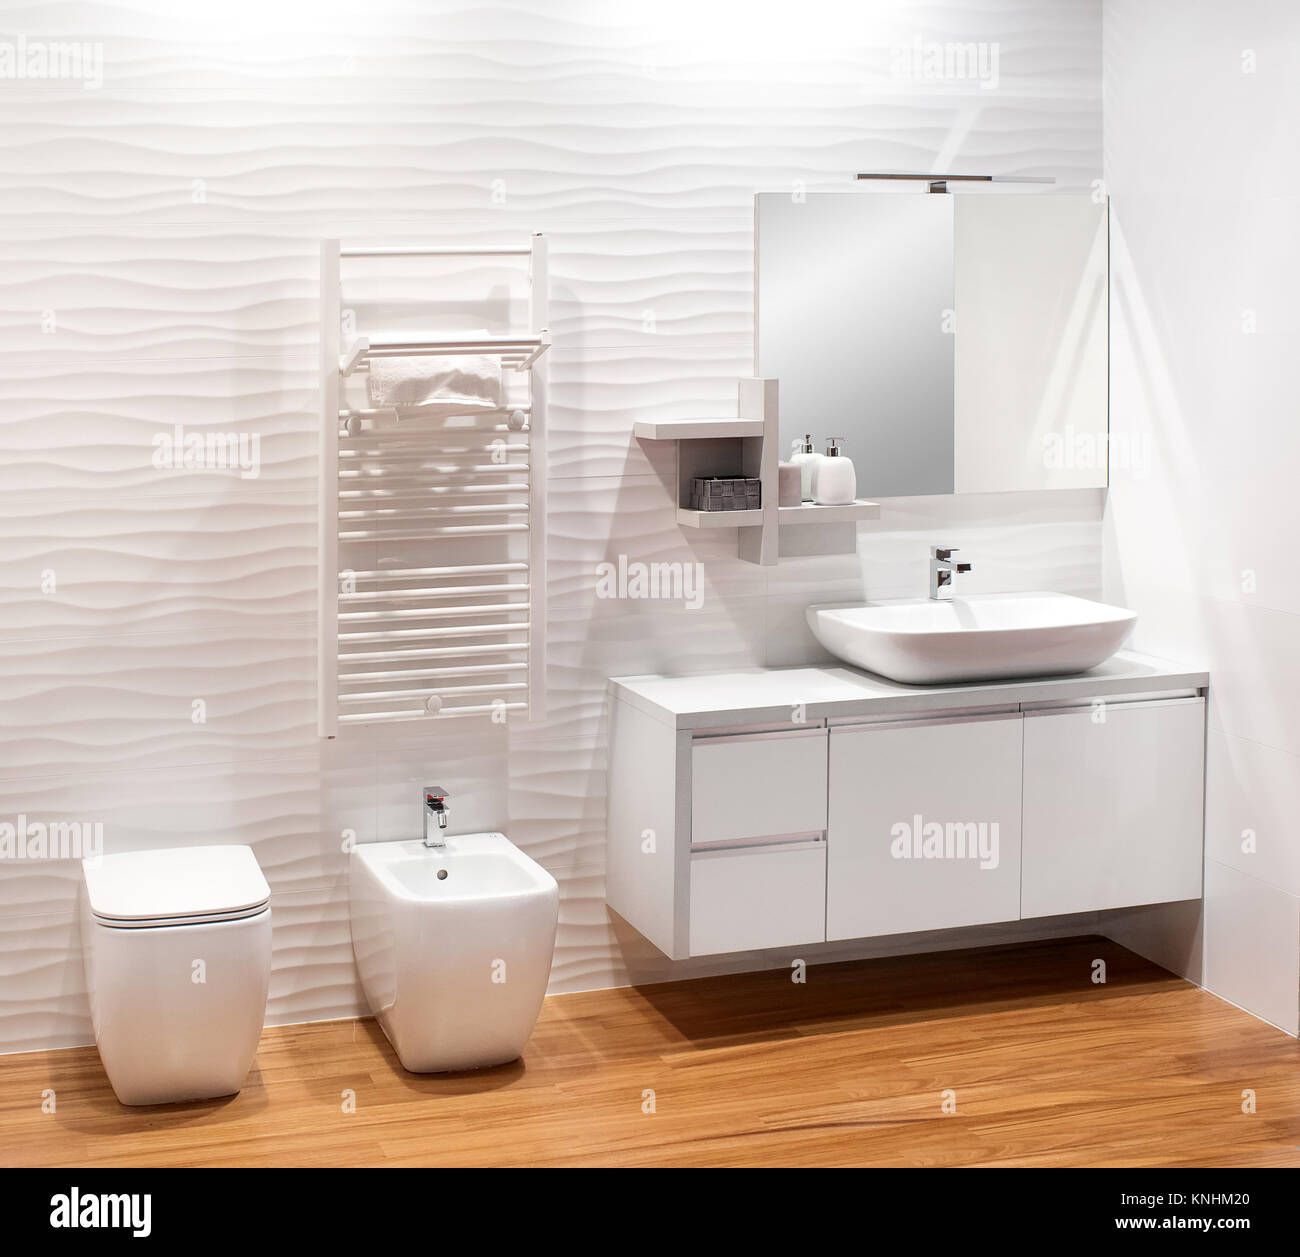 Bathroom Toilet Monochromatic Mirror Stock Photos & Bathroom Toilet ...